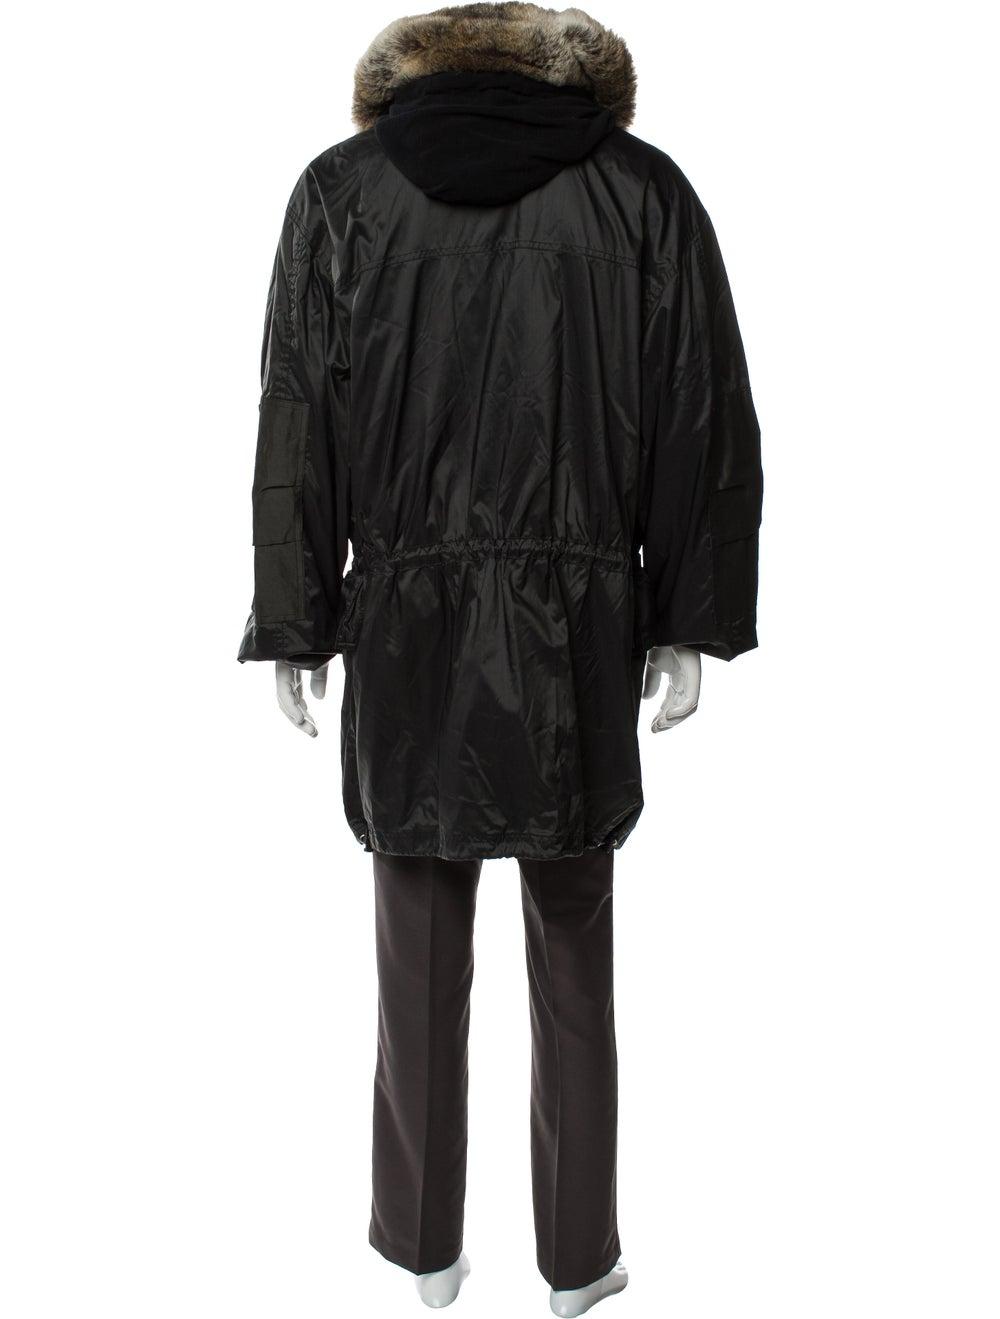 Versace Sport Jacket Black - image 3